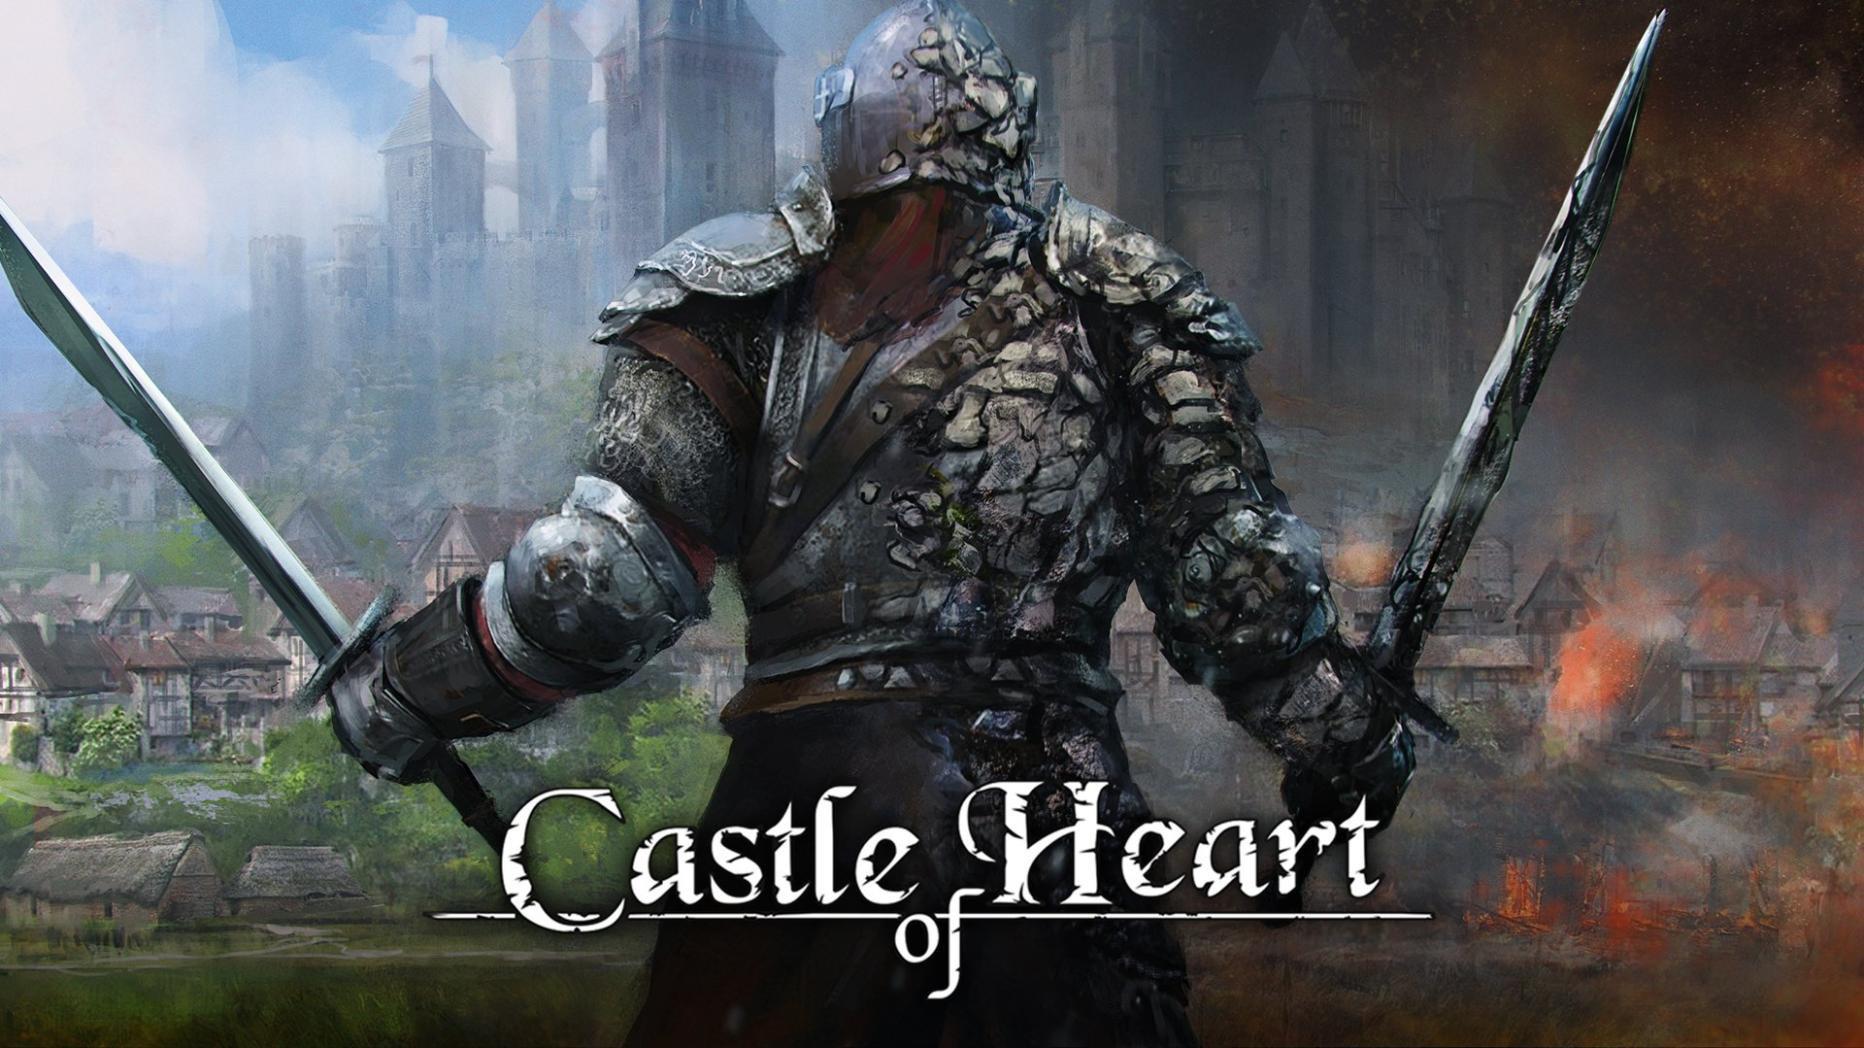 Castle of Heart Nintendo Switch EShop